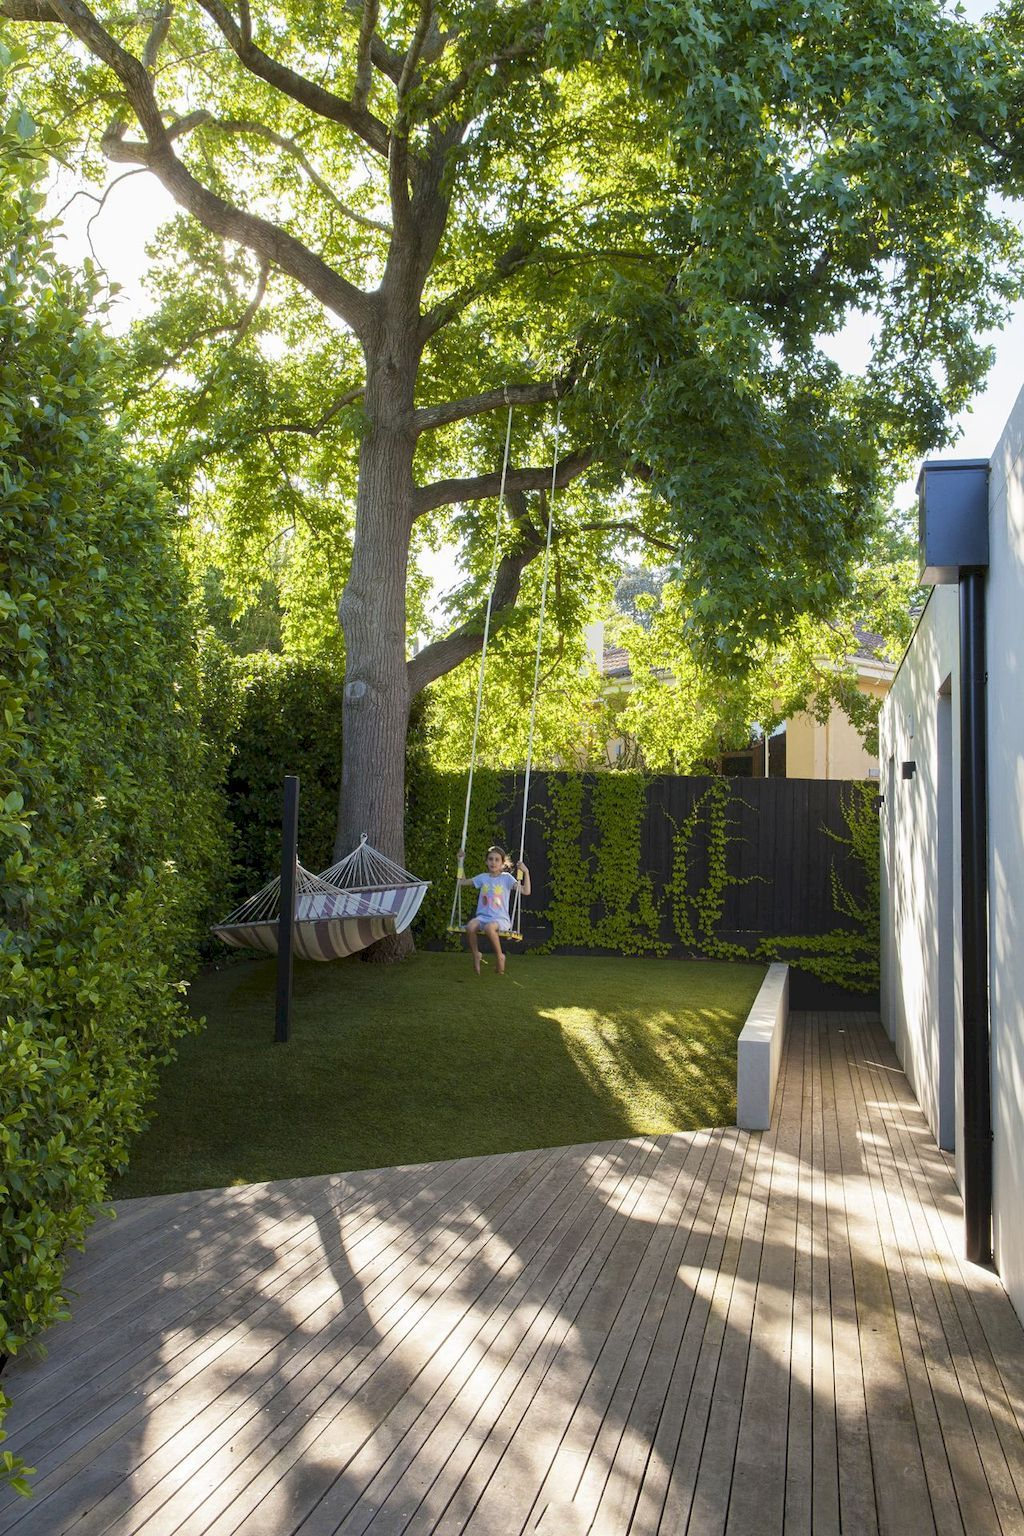 75 gorgeous small backyard landscaping ideas homekover on gorgeous small backyard landscaping ideas id=80373